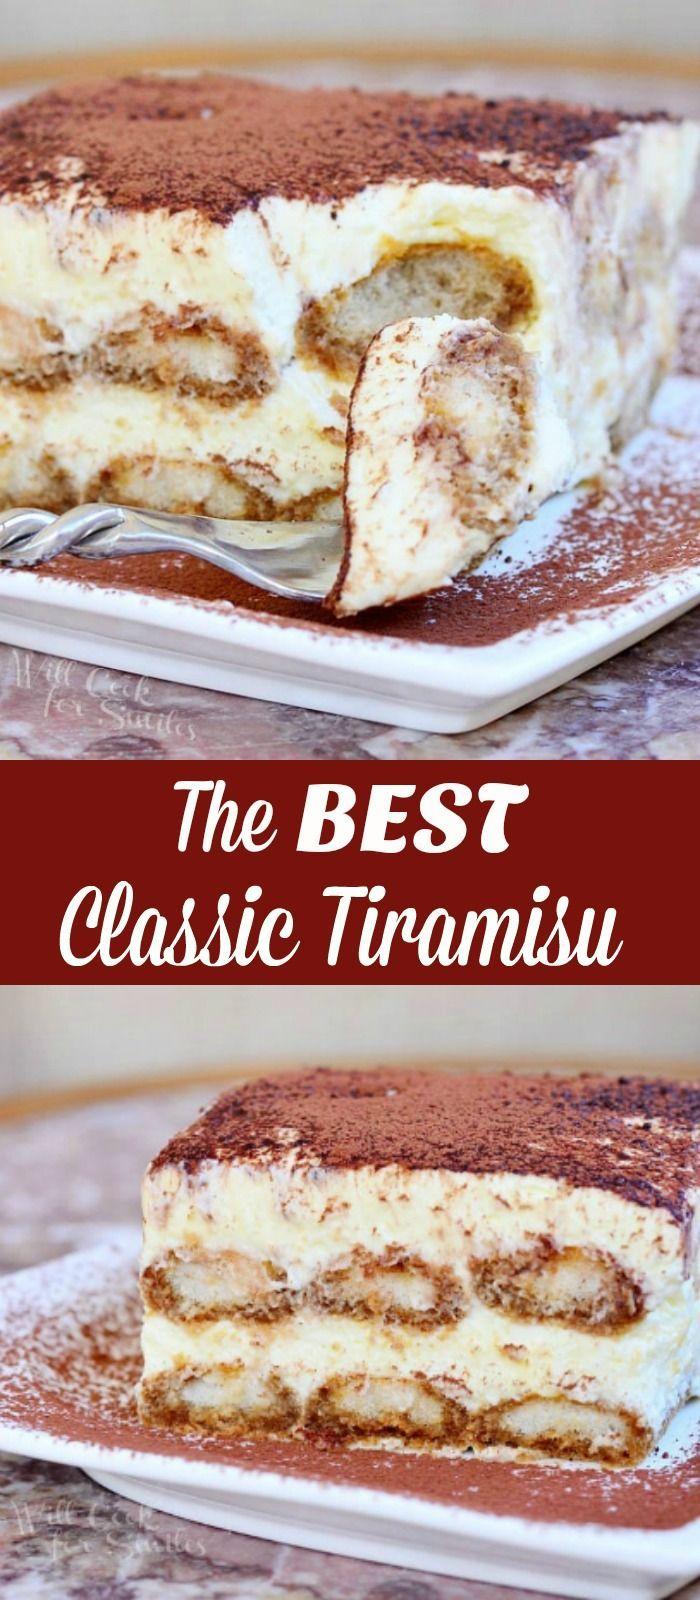 The Best Classic Tiramisu In 2020 Tiramisu Recipe Yummy Food Dessert Delicious Desserts